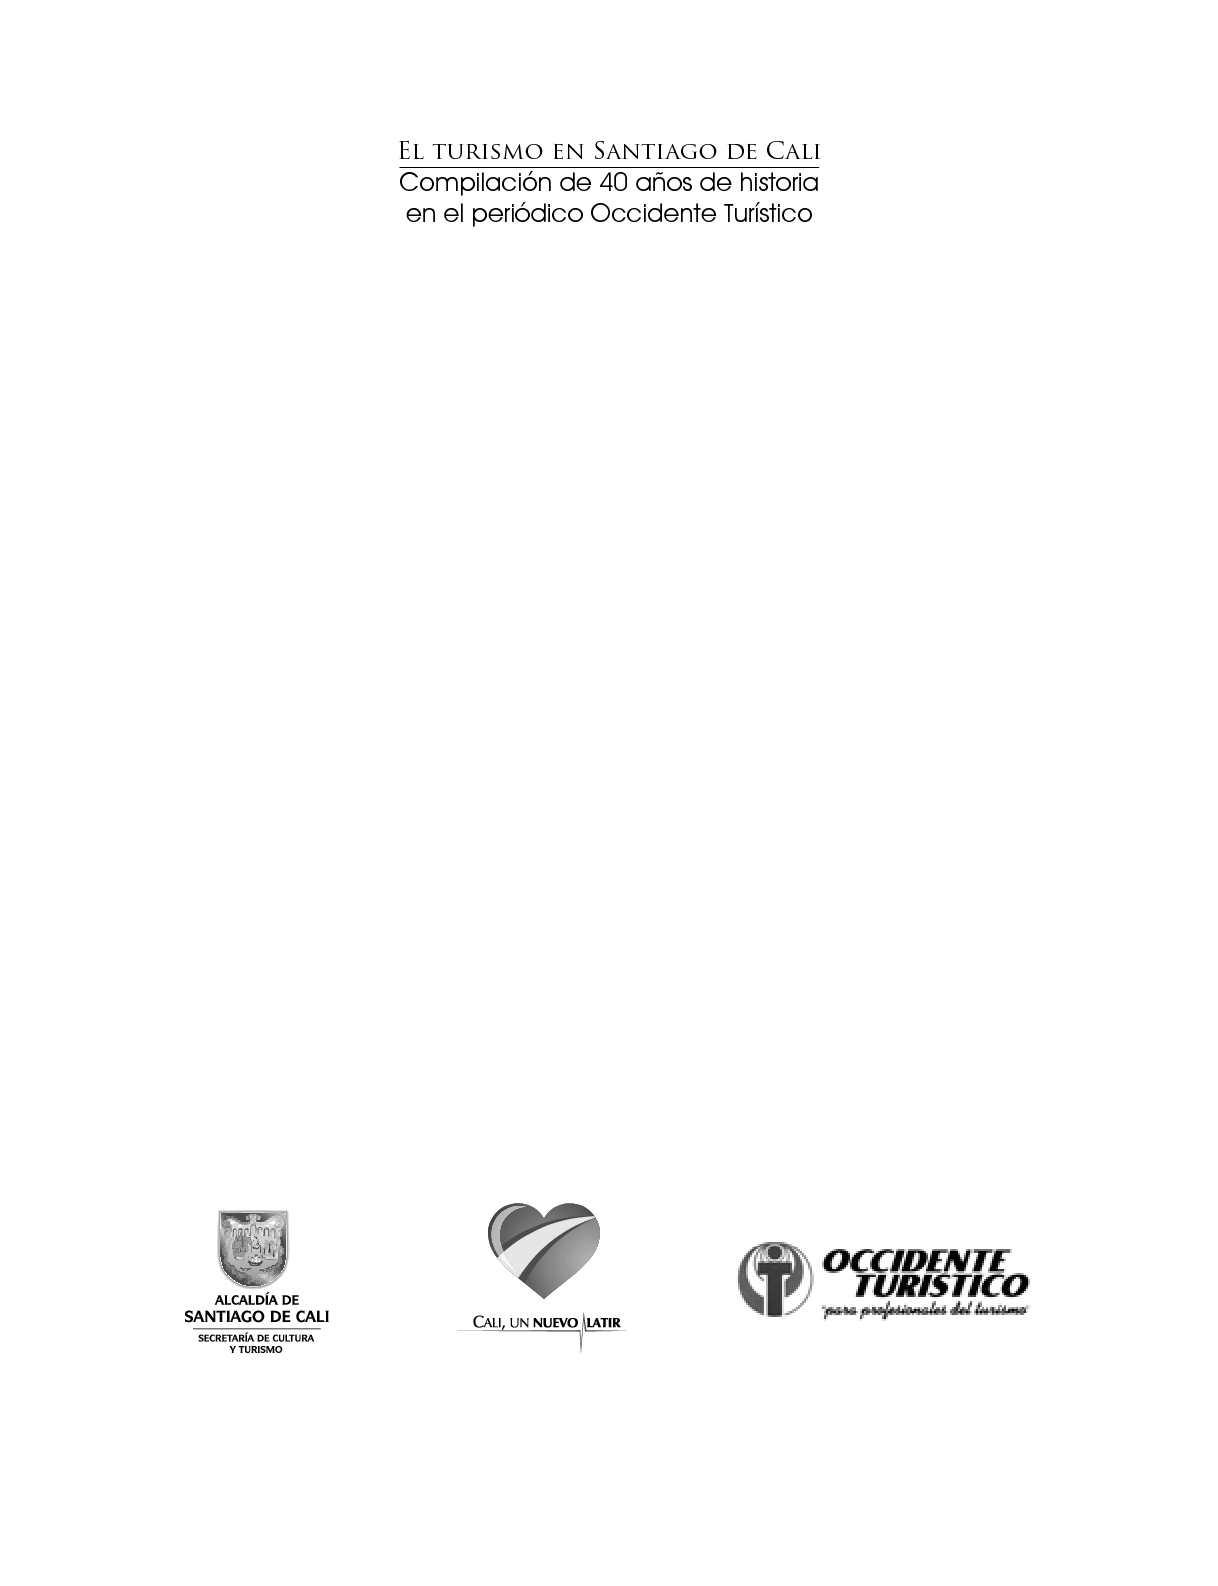 Calaméo - Historia del Turismo en Santiago de Cali